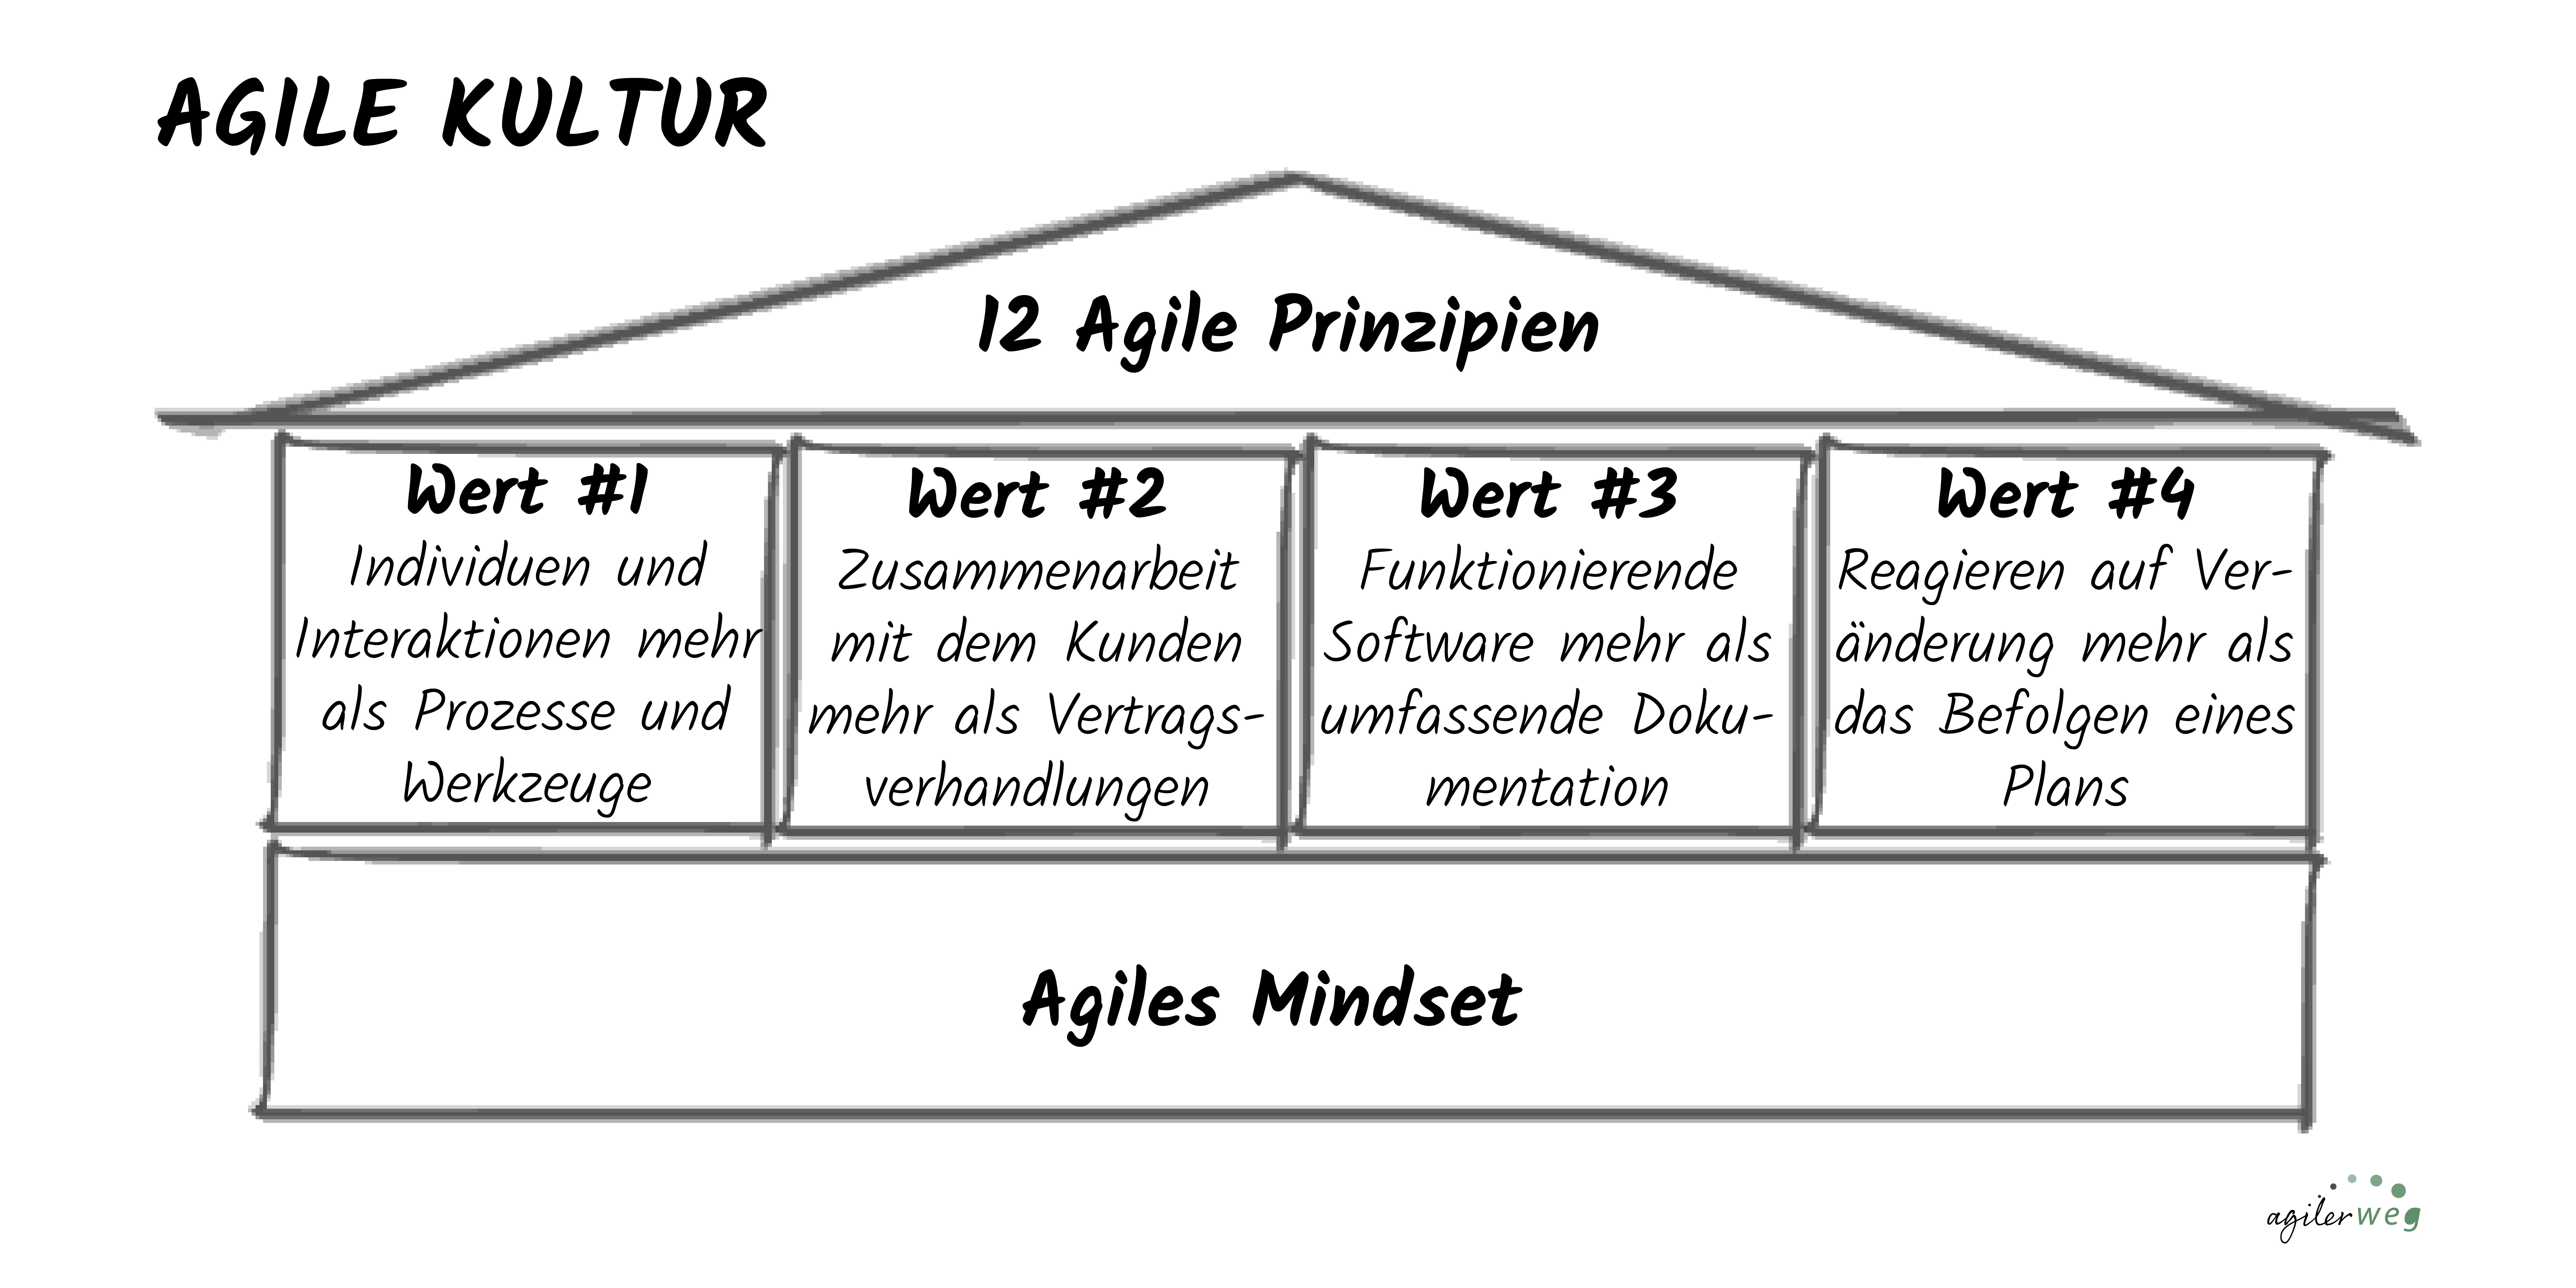 agile Kultur